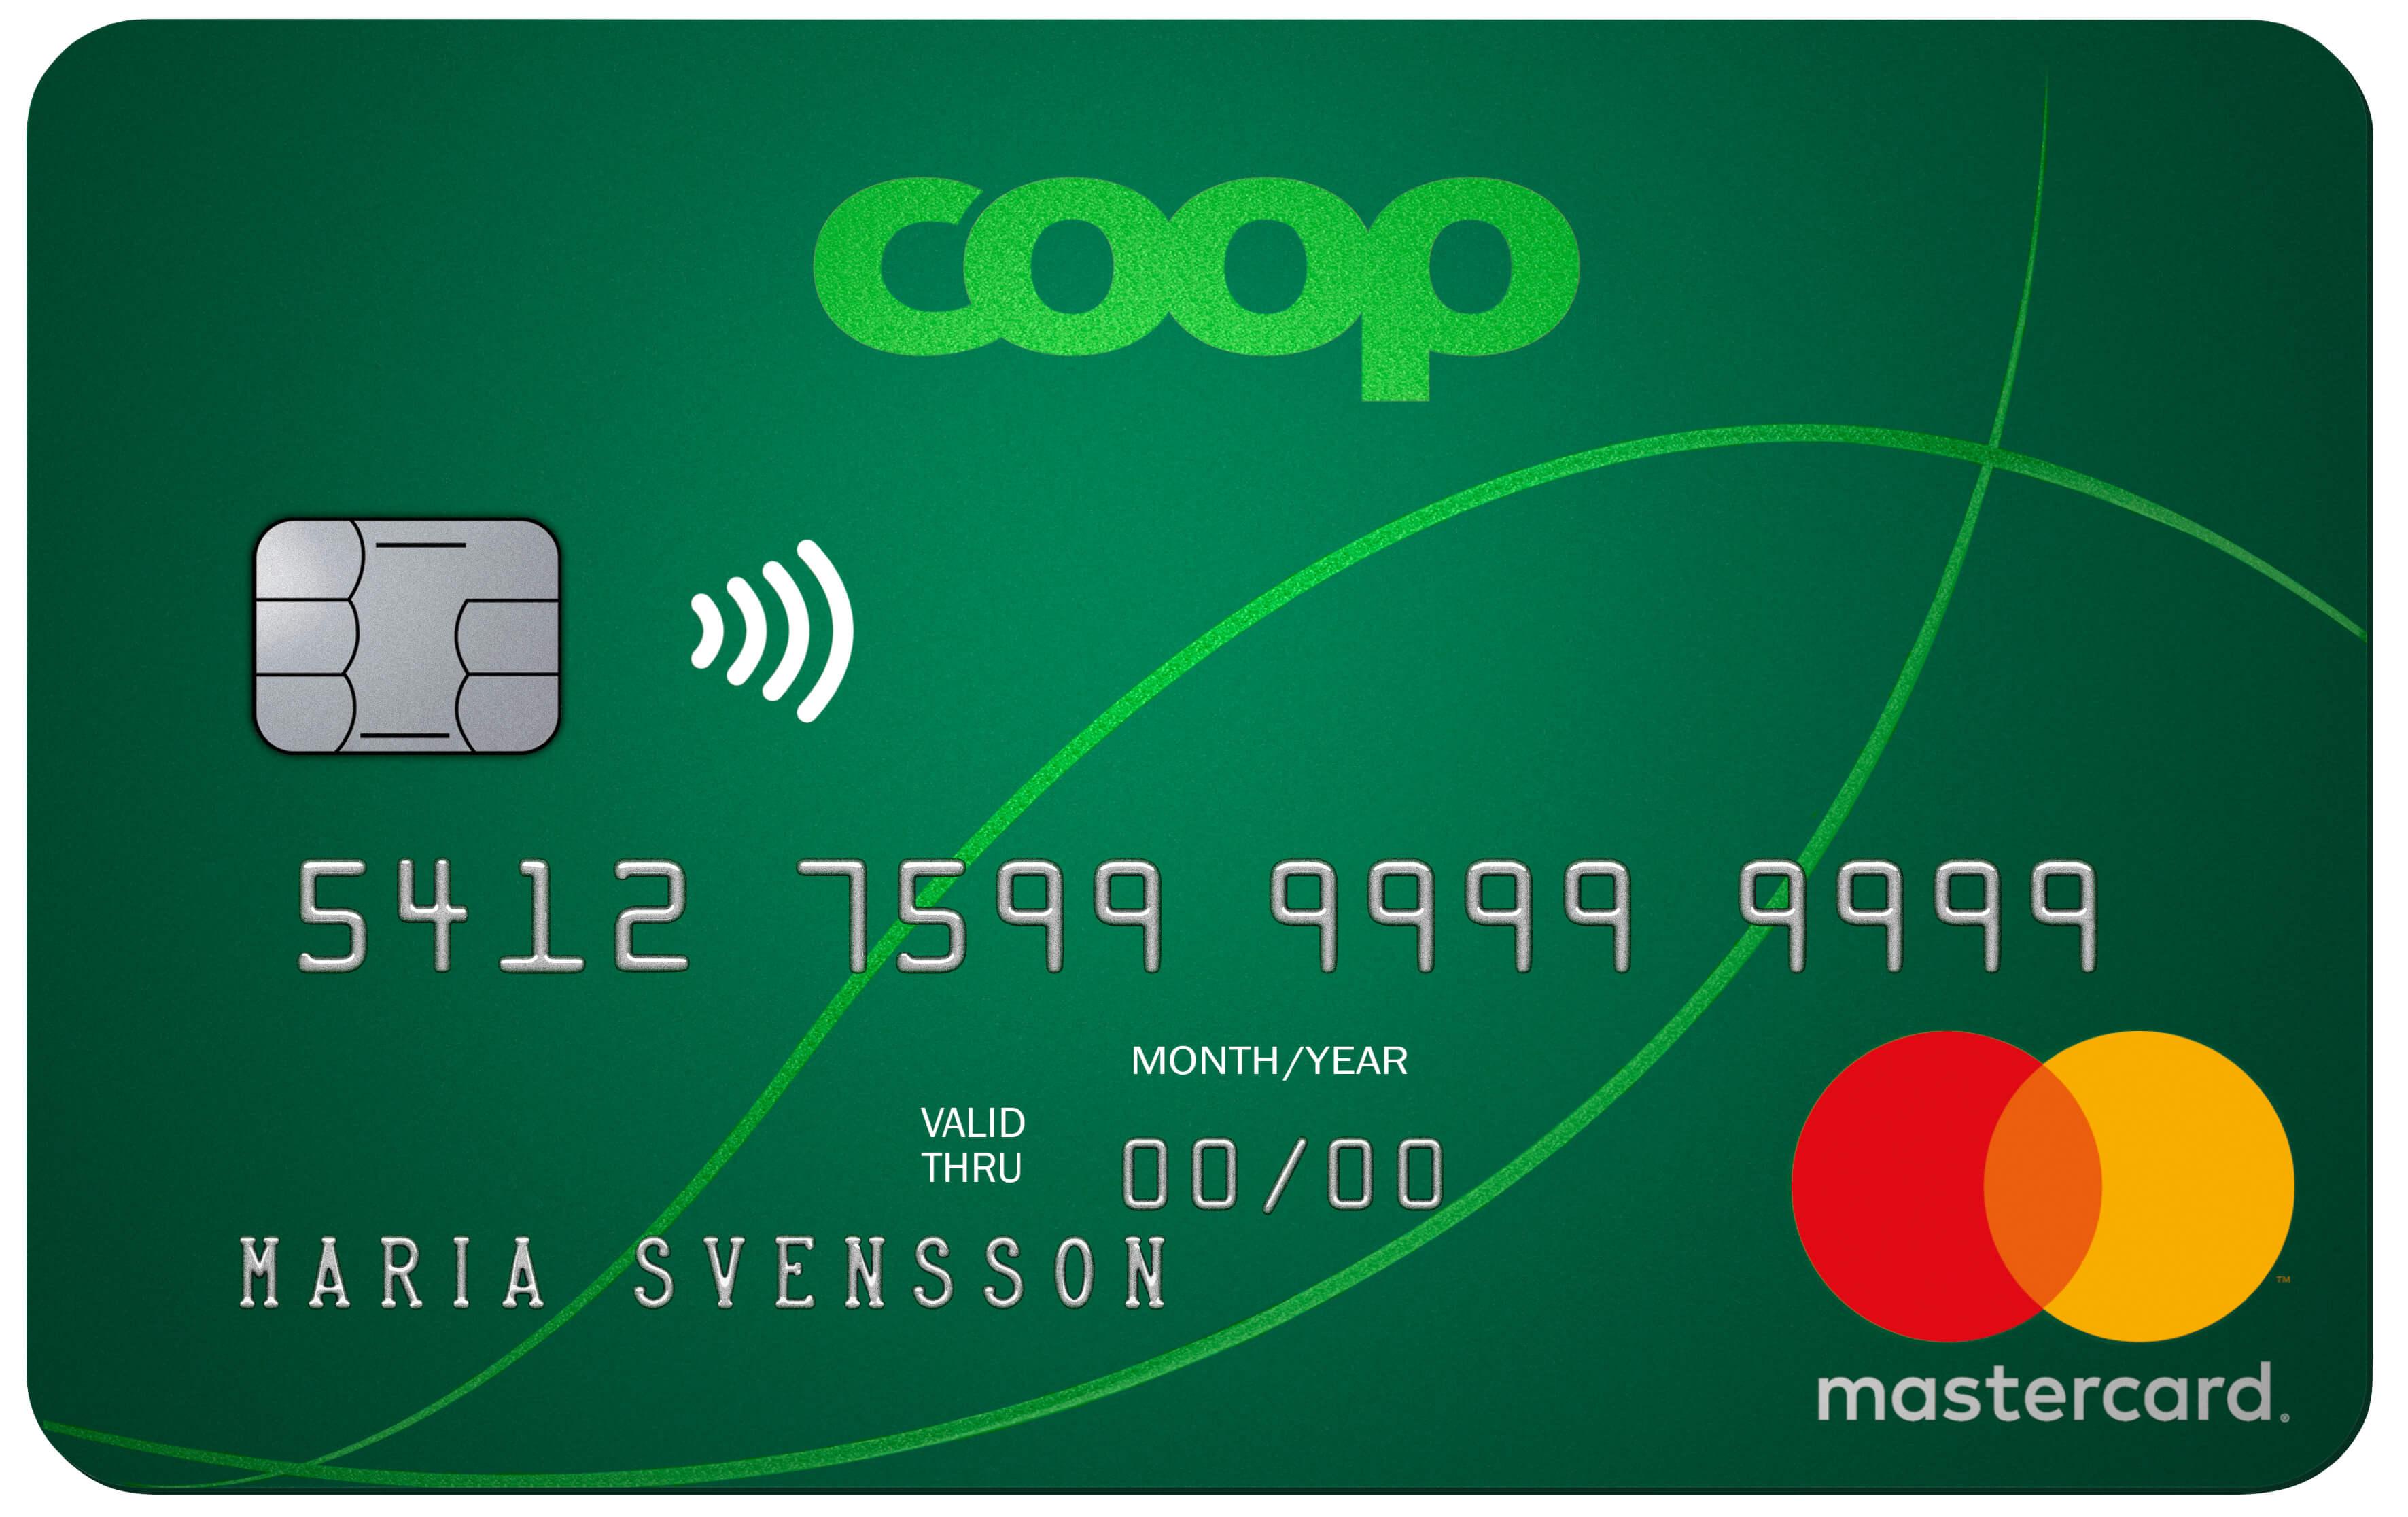 mervärde entercard.se